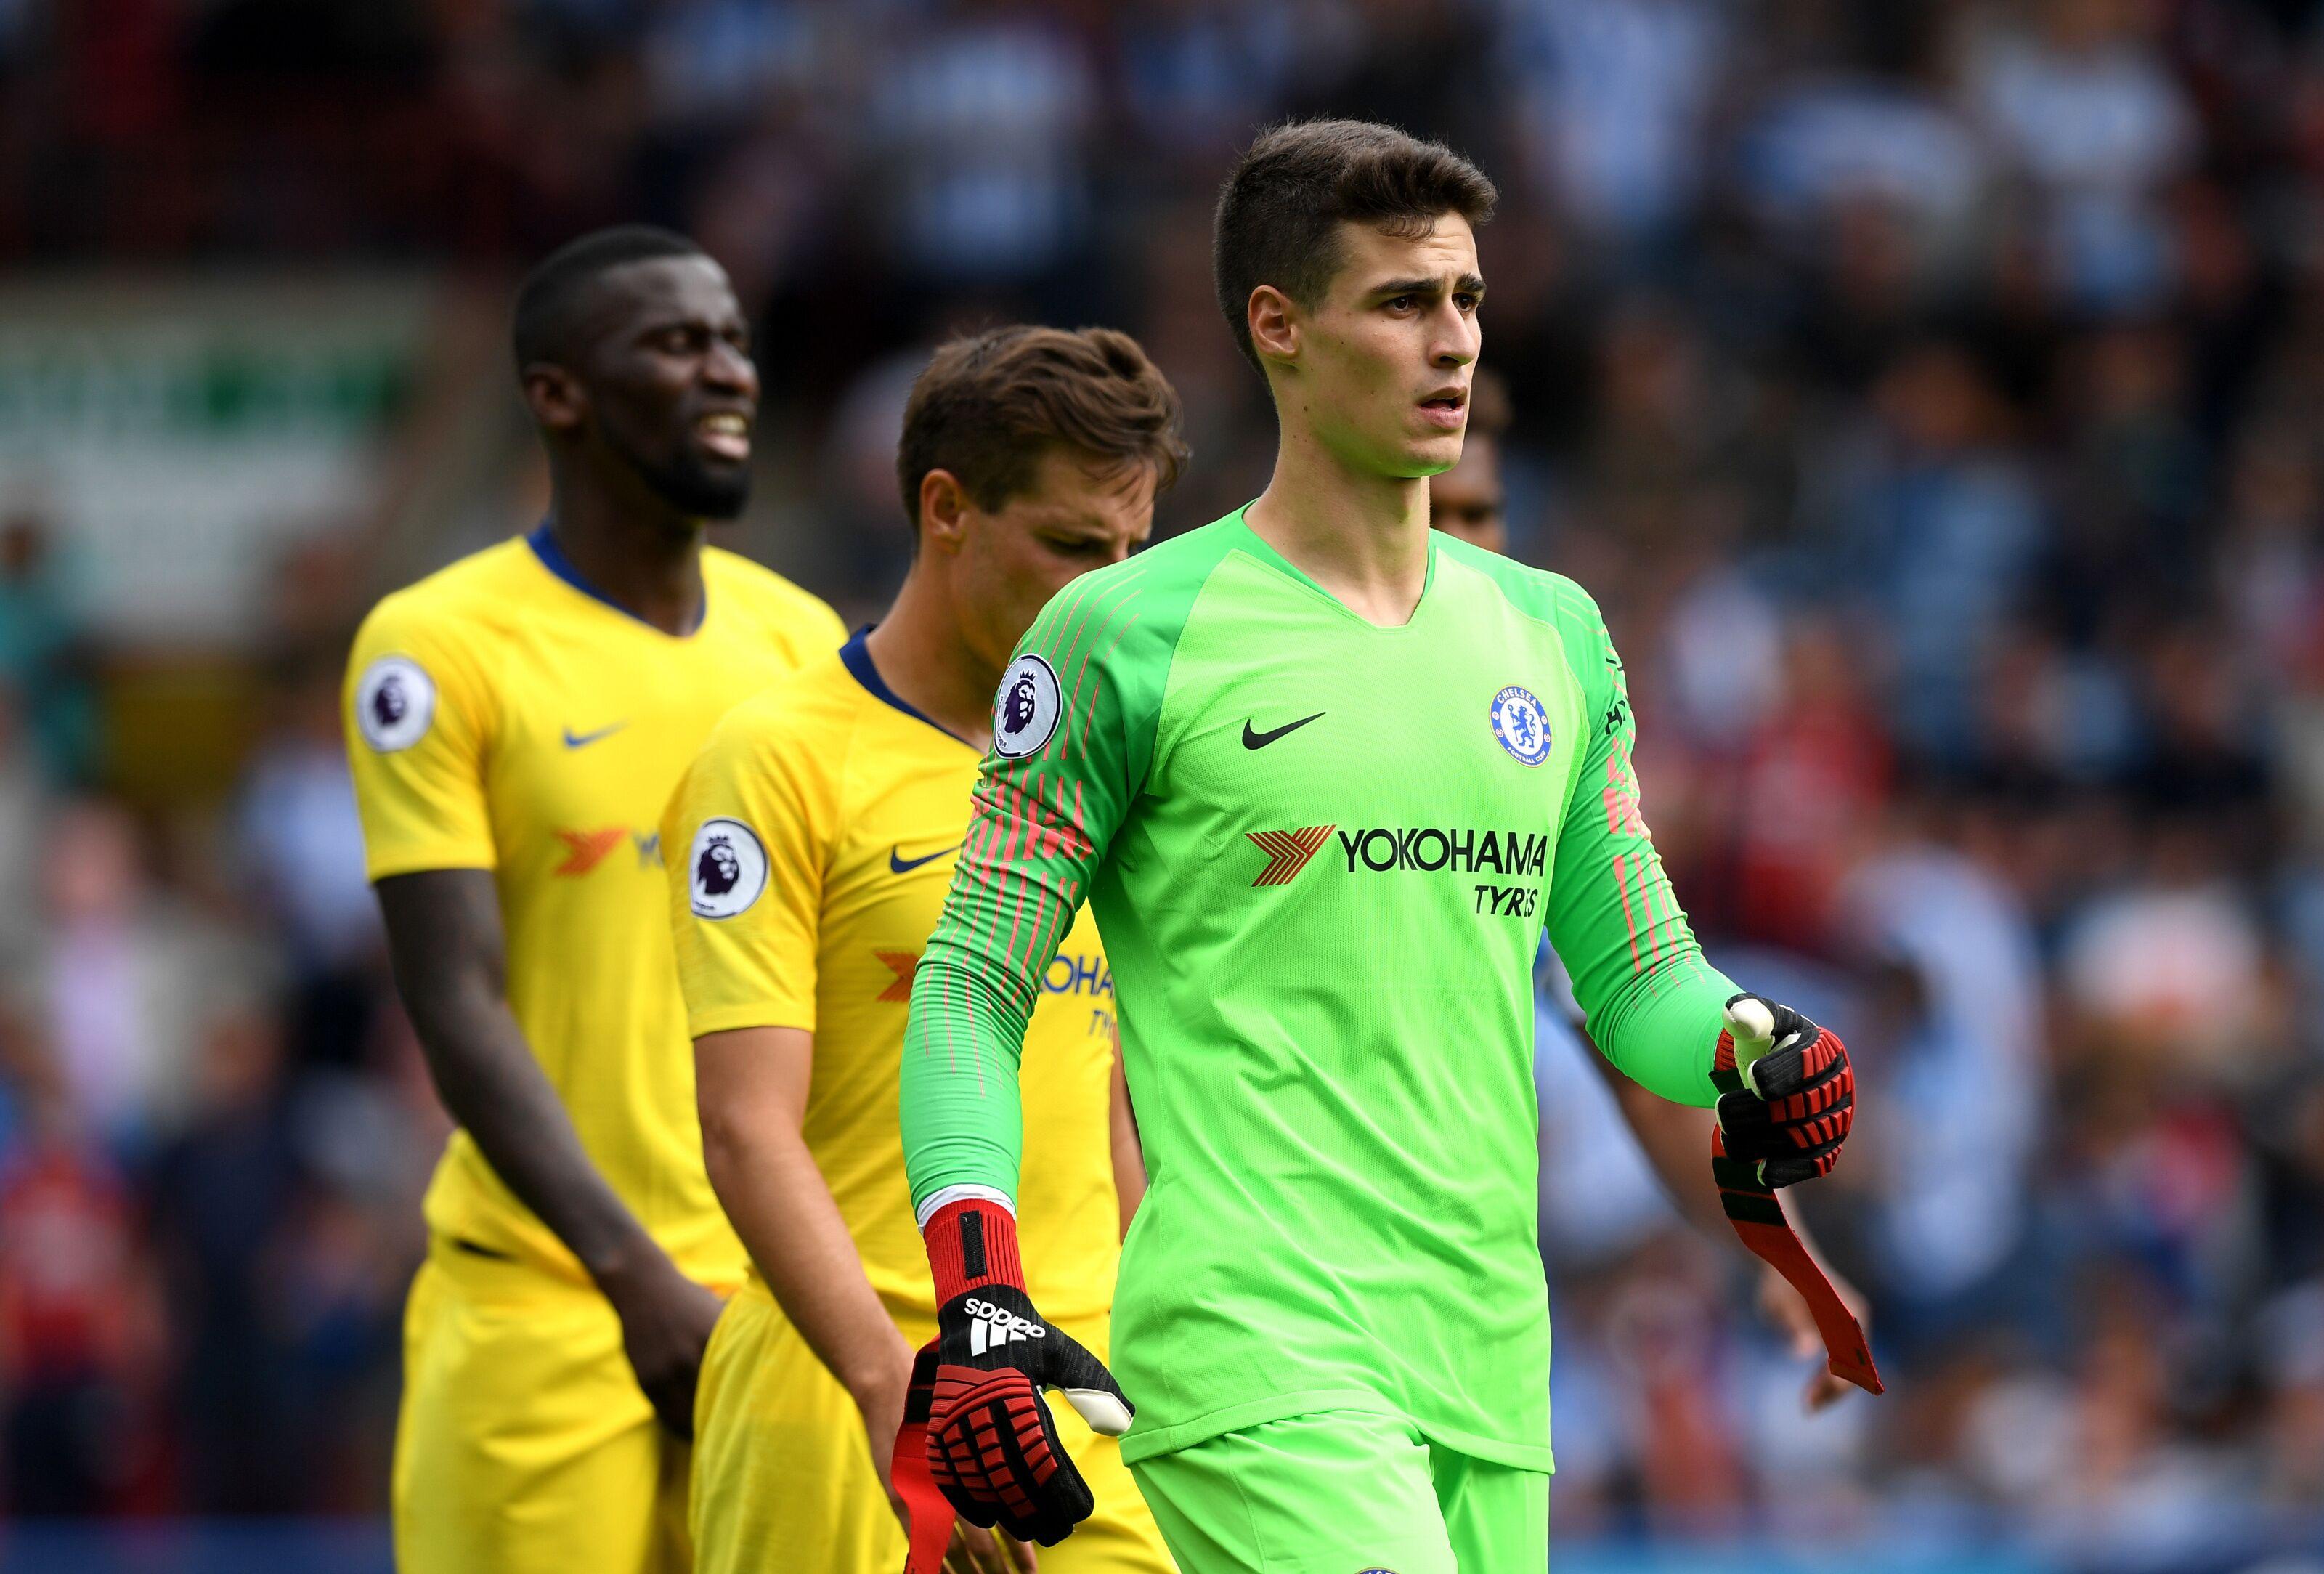 Huddersfield England August  Kepa Arrizabalaga Of Chelsea Looks On During The Premier